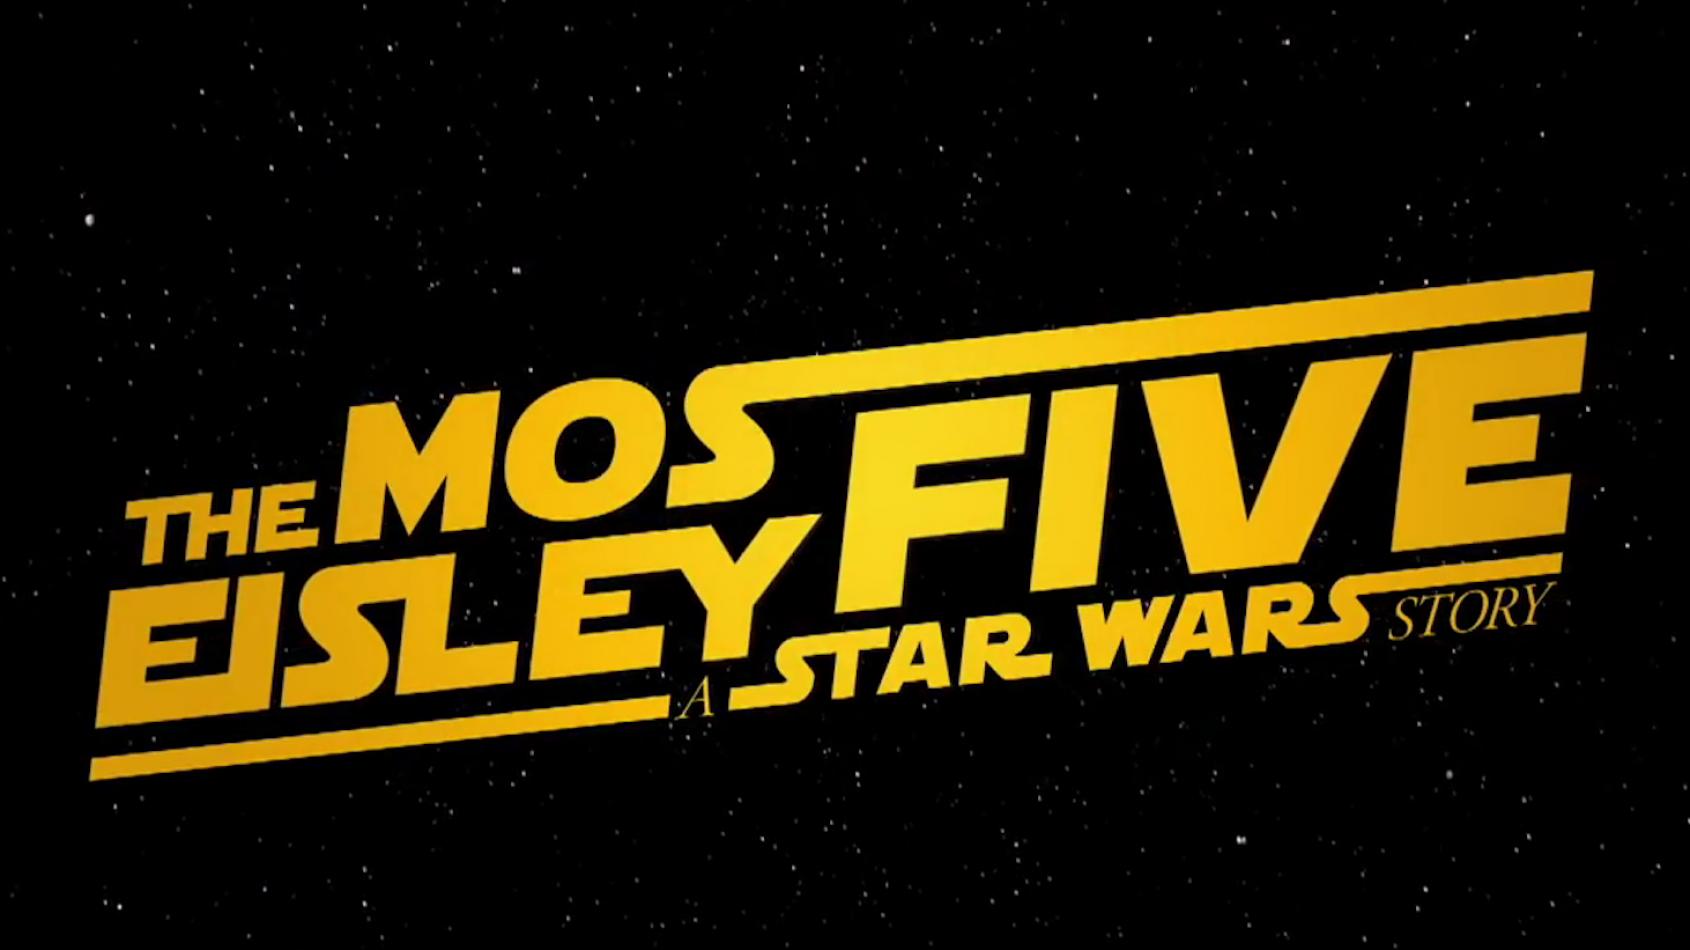 Un sketch Star Wars avec JJ Abrams  et Charles Barkley